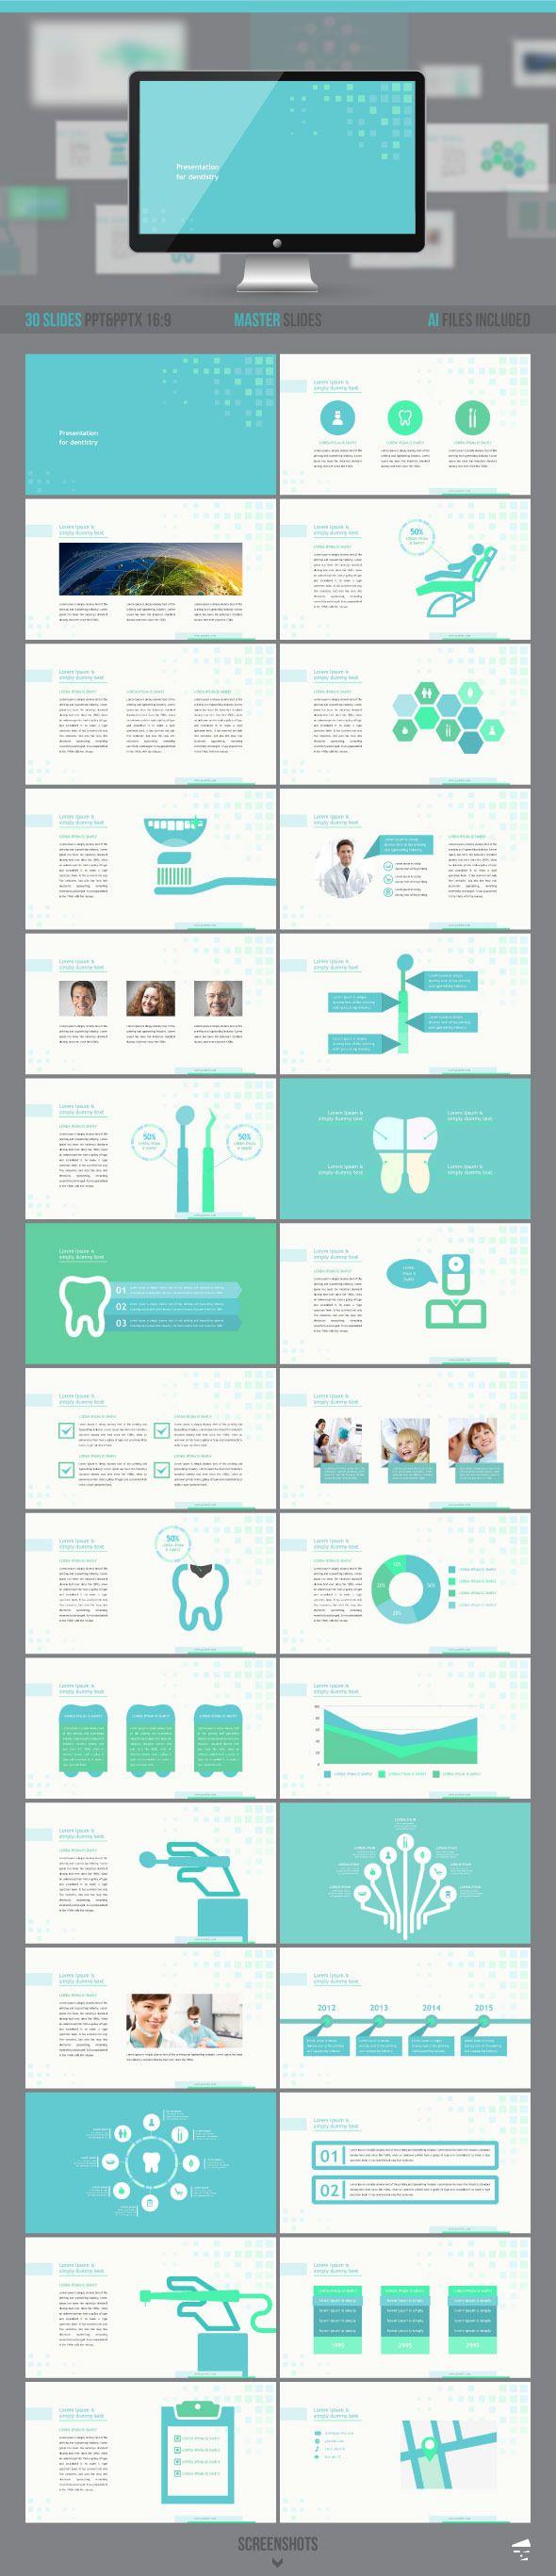 Dental Presentation Template #powerpoint #powerpointtemplate #presentation Download: http://graphicriver.net/item/dental-presentation/9709360?ref=ksioks